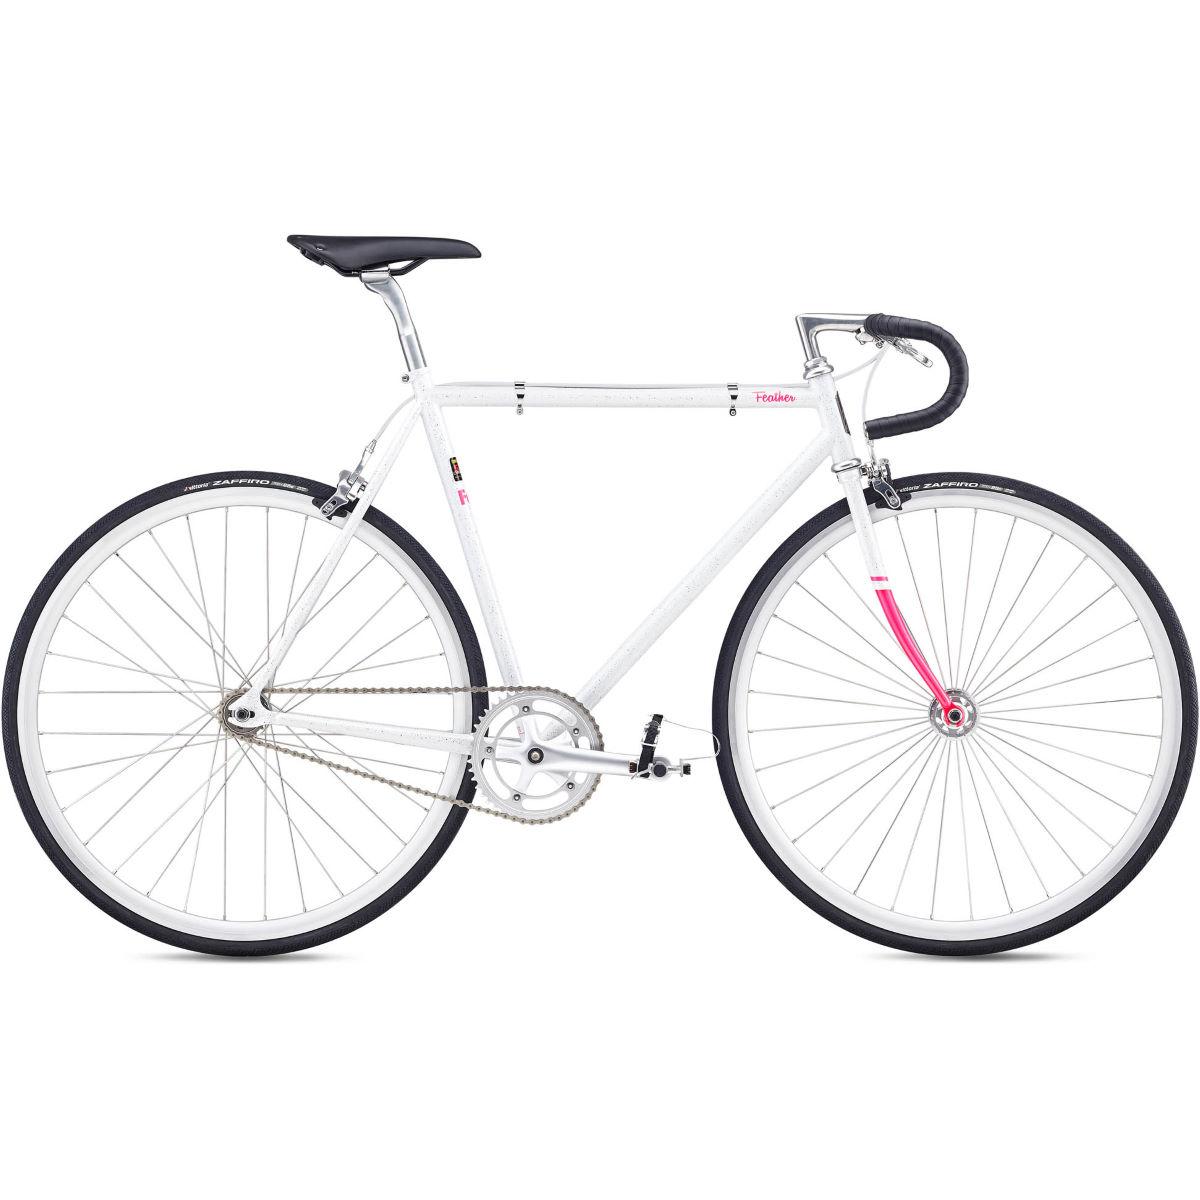 Fuji feather city bike deal